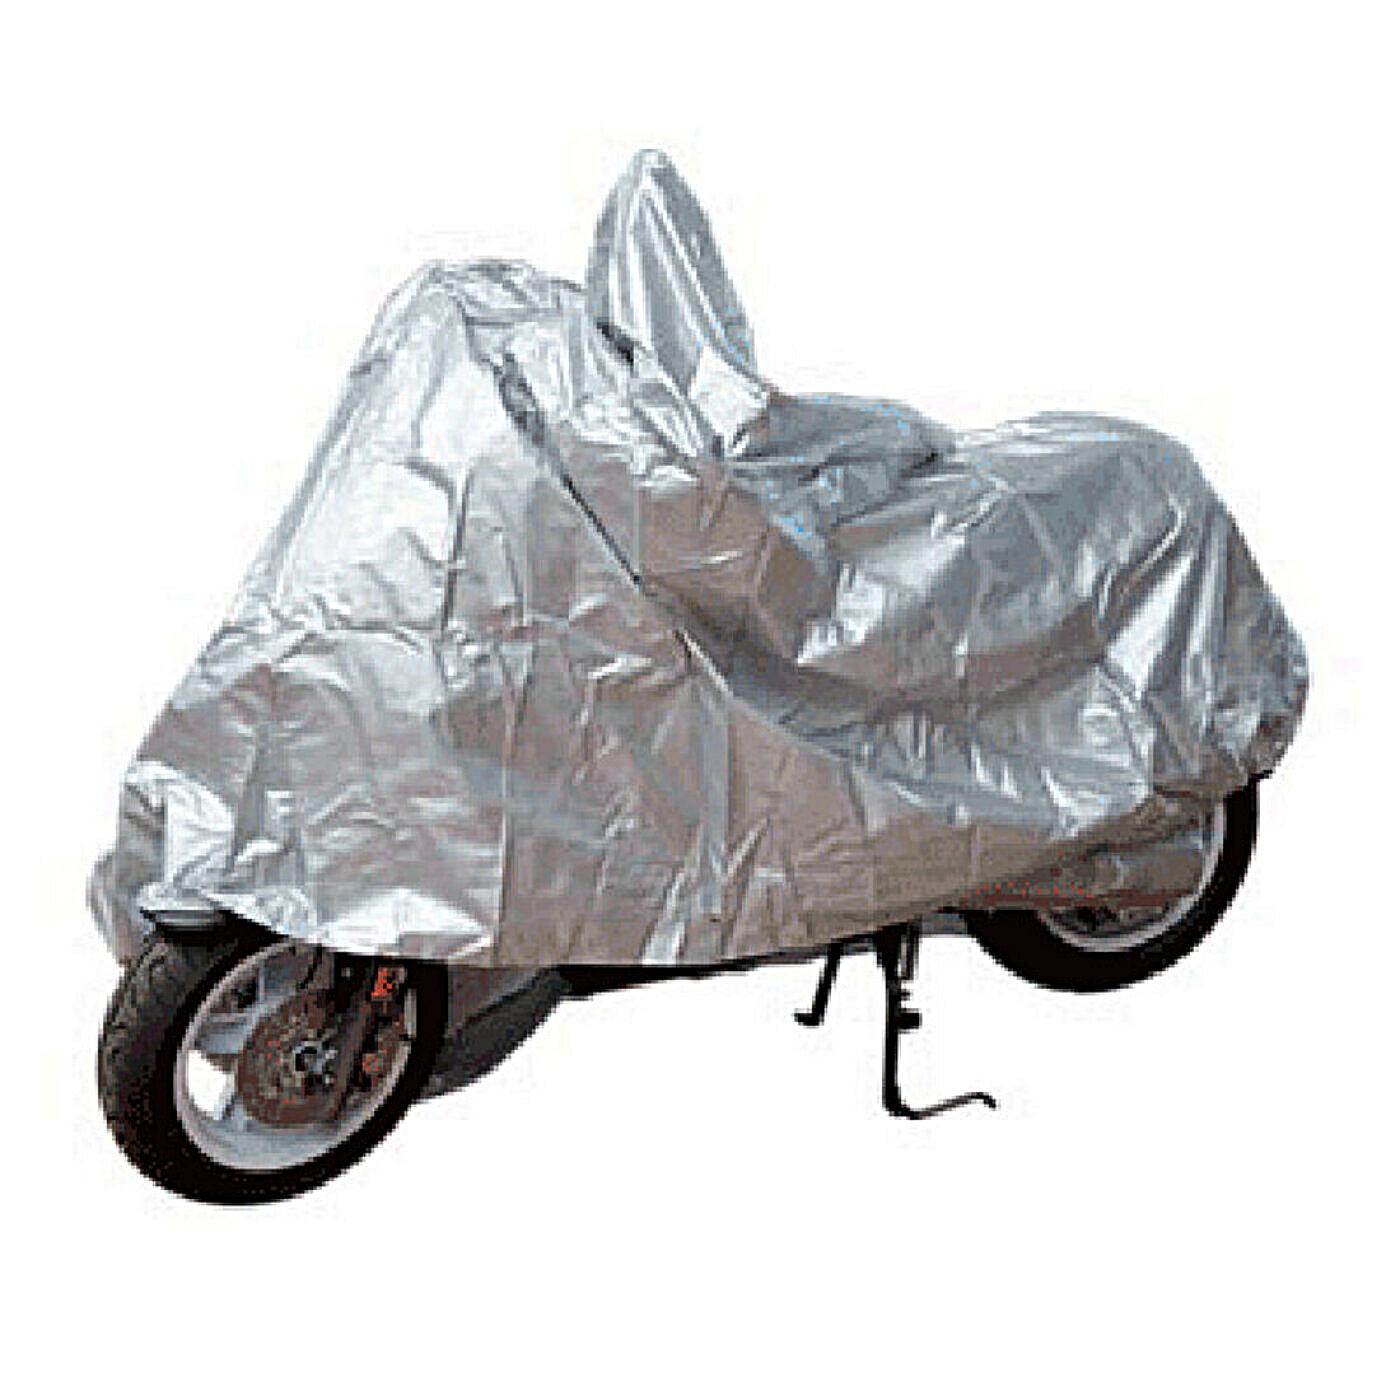 Housse de protection scooter/moto Steev - M